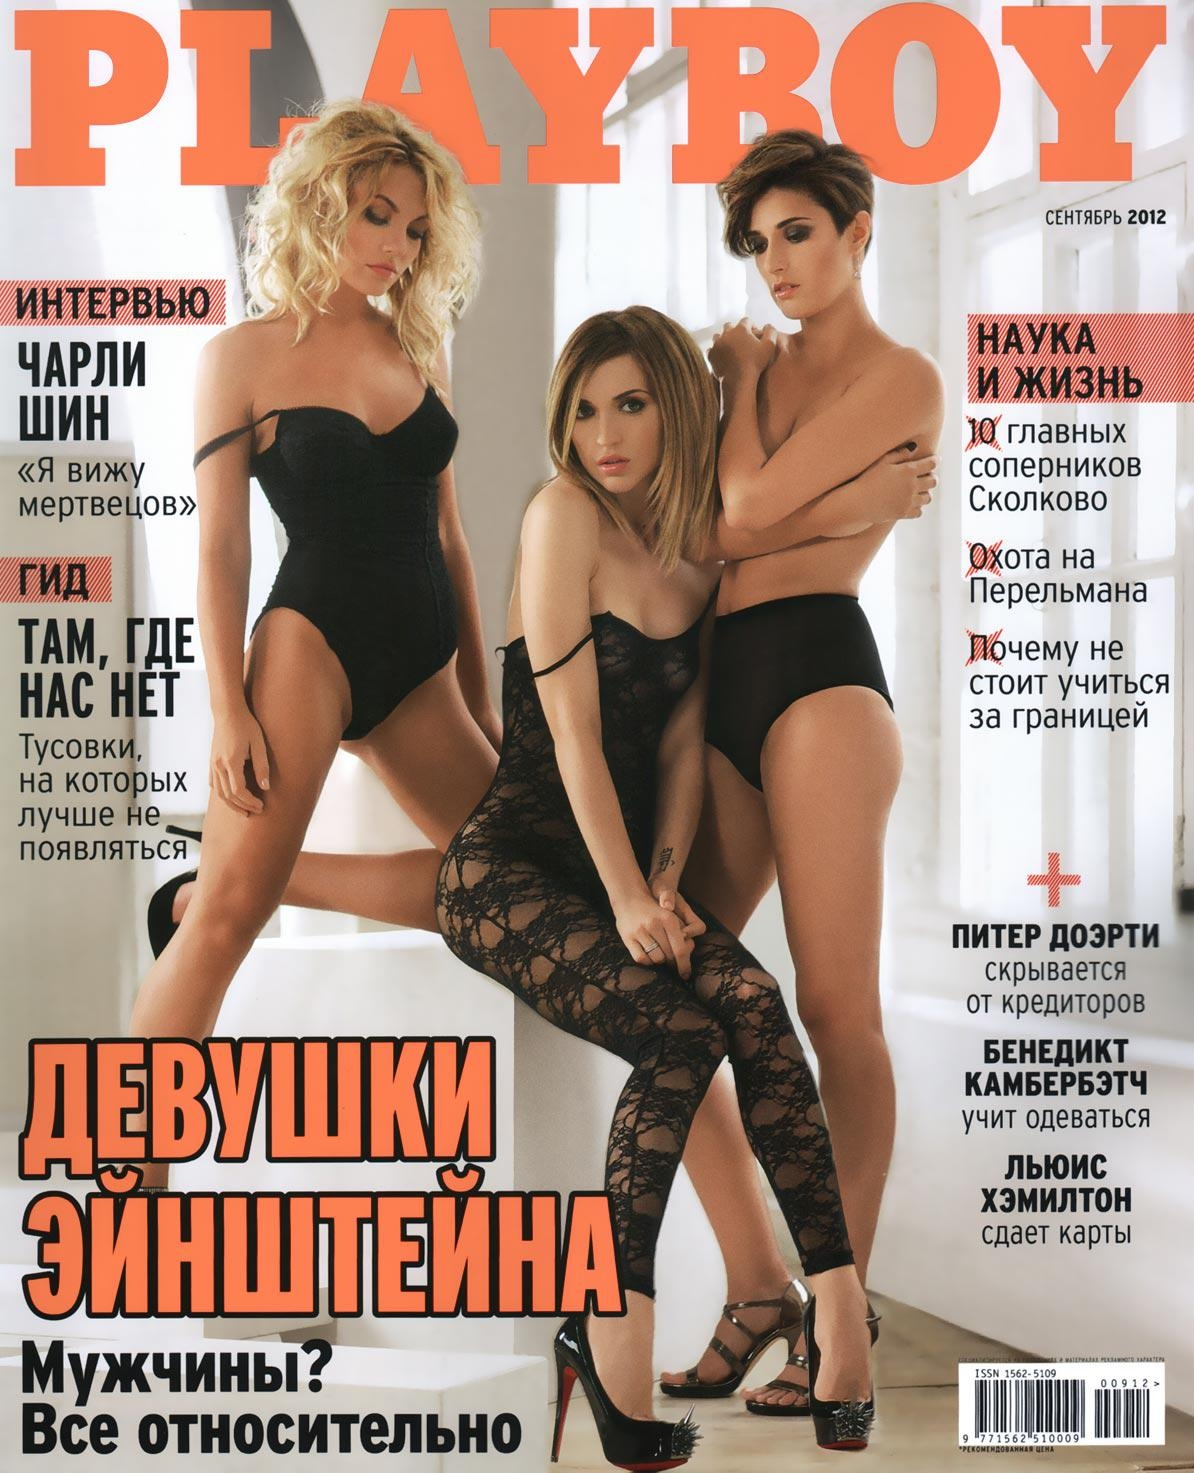 Секс видео журнала плейбой